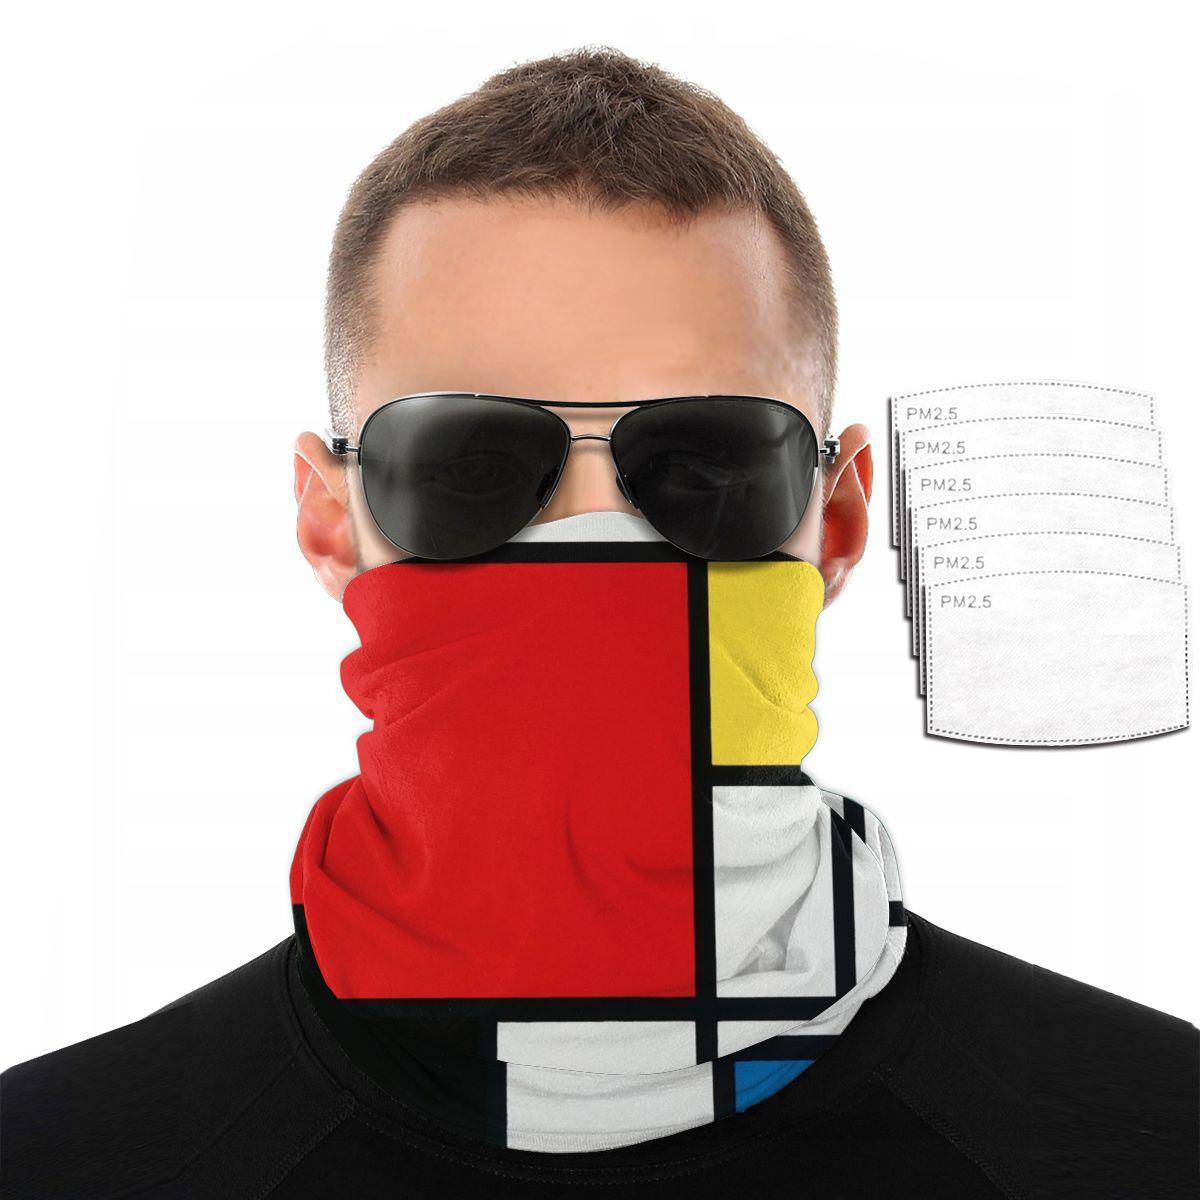 Bandana Neck Gaiter Headband Cycling Fishing Mask Scarf Piet Mondrian Multifunctional Outdoor Headwear